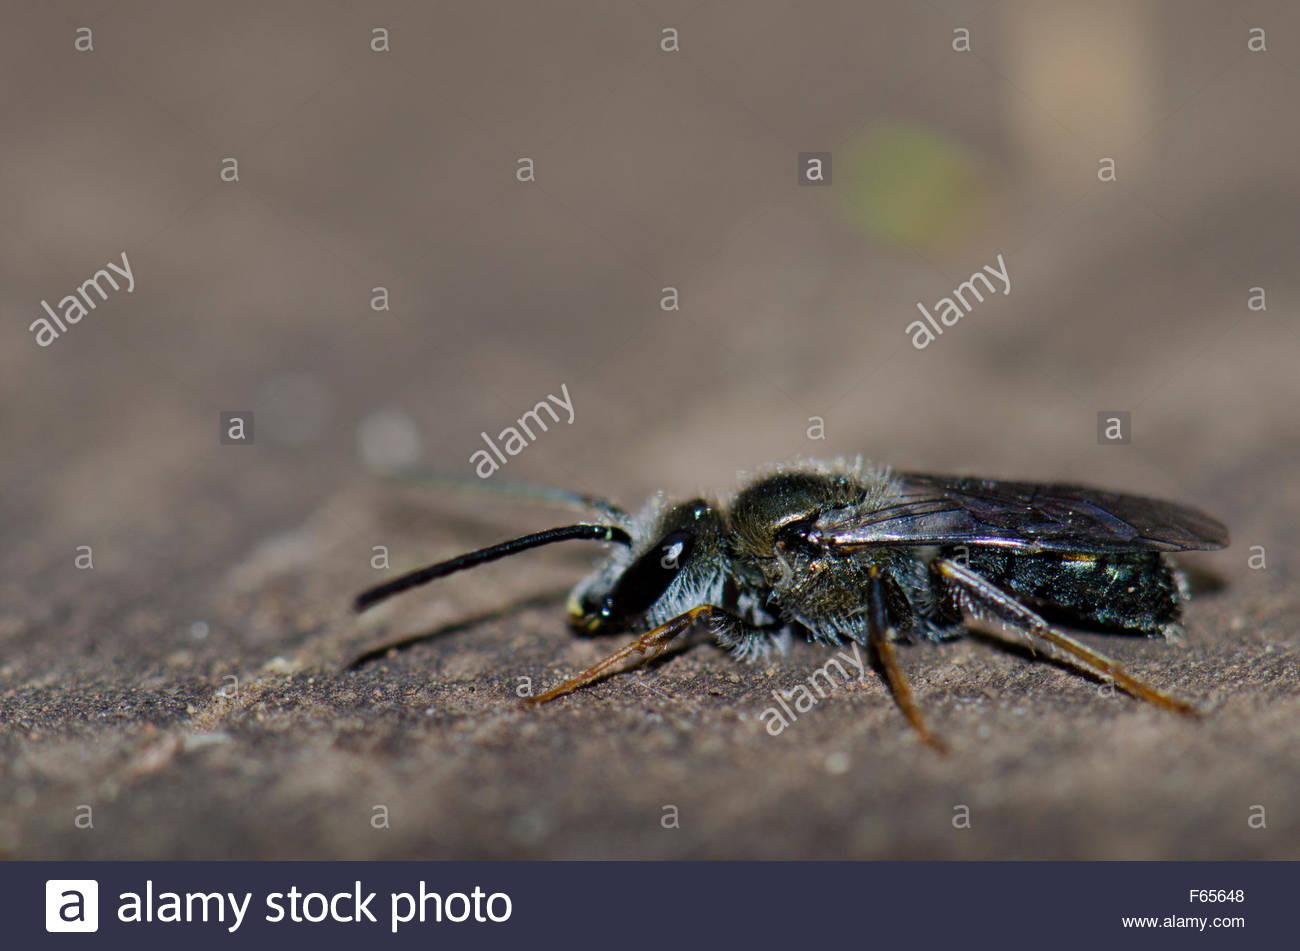 Wasp. La Laguna Grande. Garajonay National Park. Island of La Gomera. Canary Islands. Spain. - Stock Image